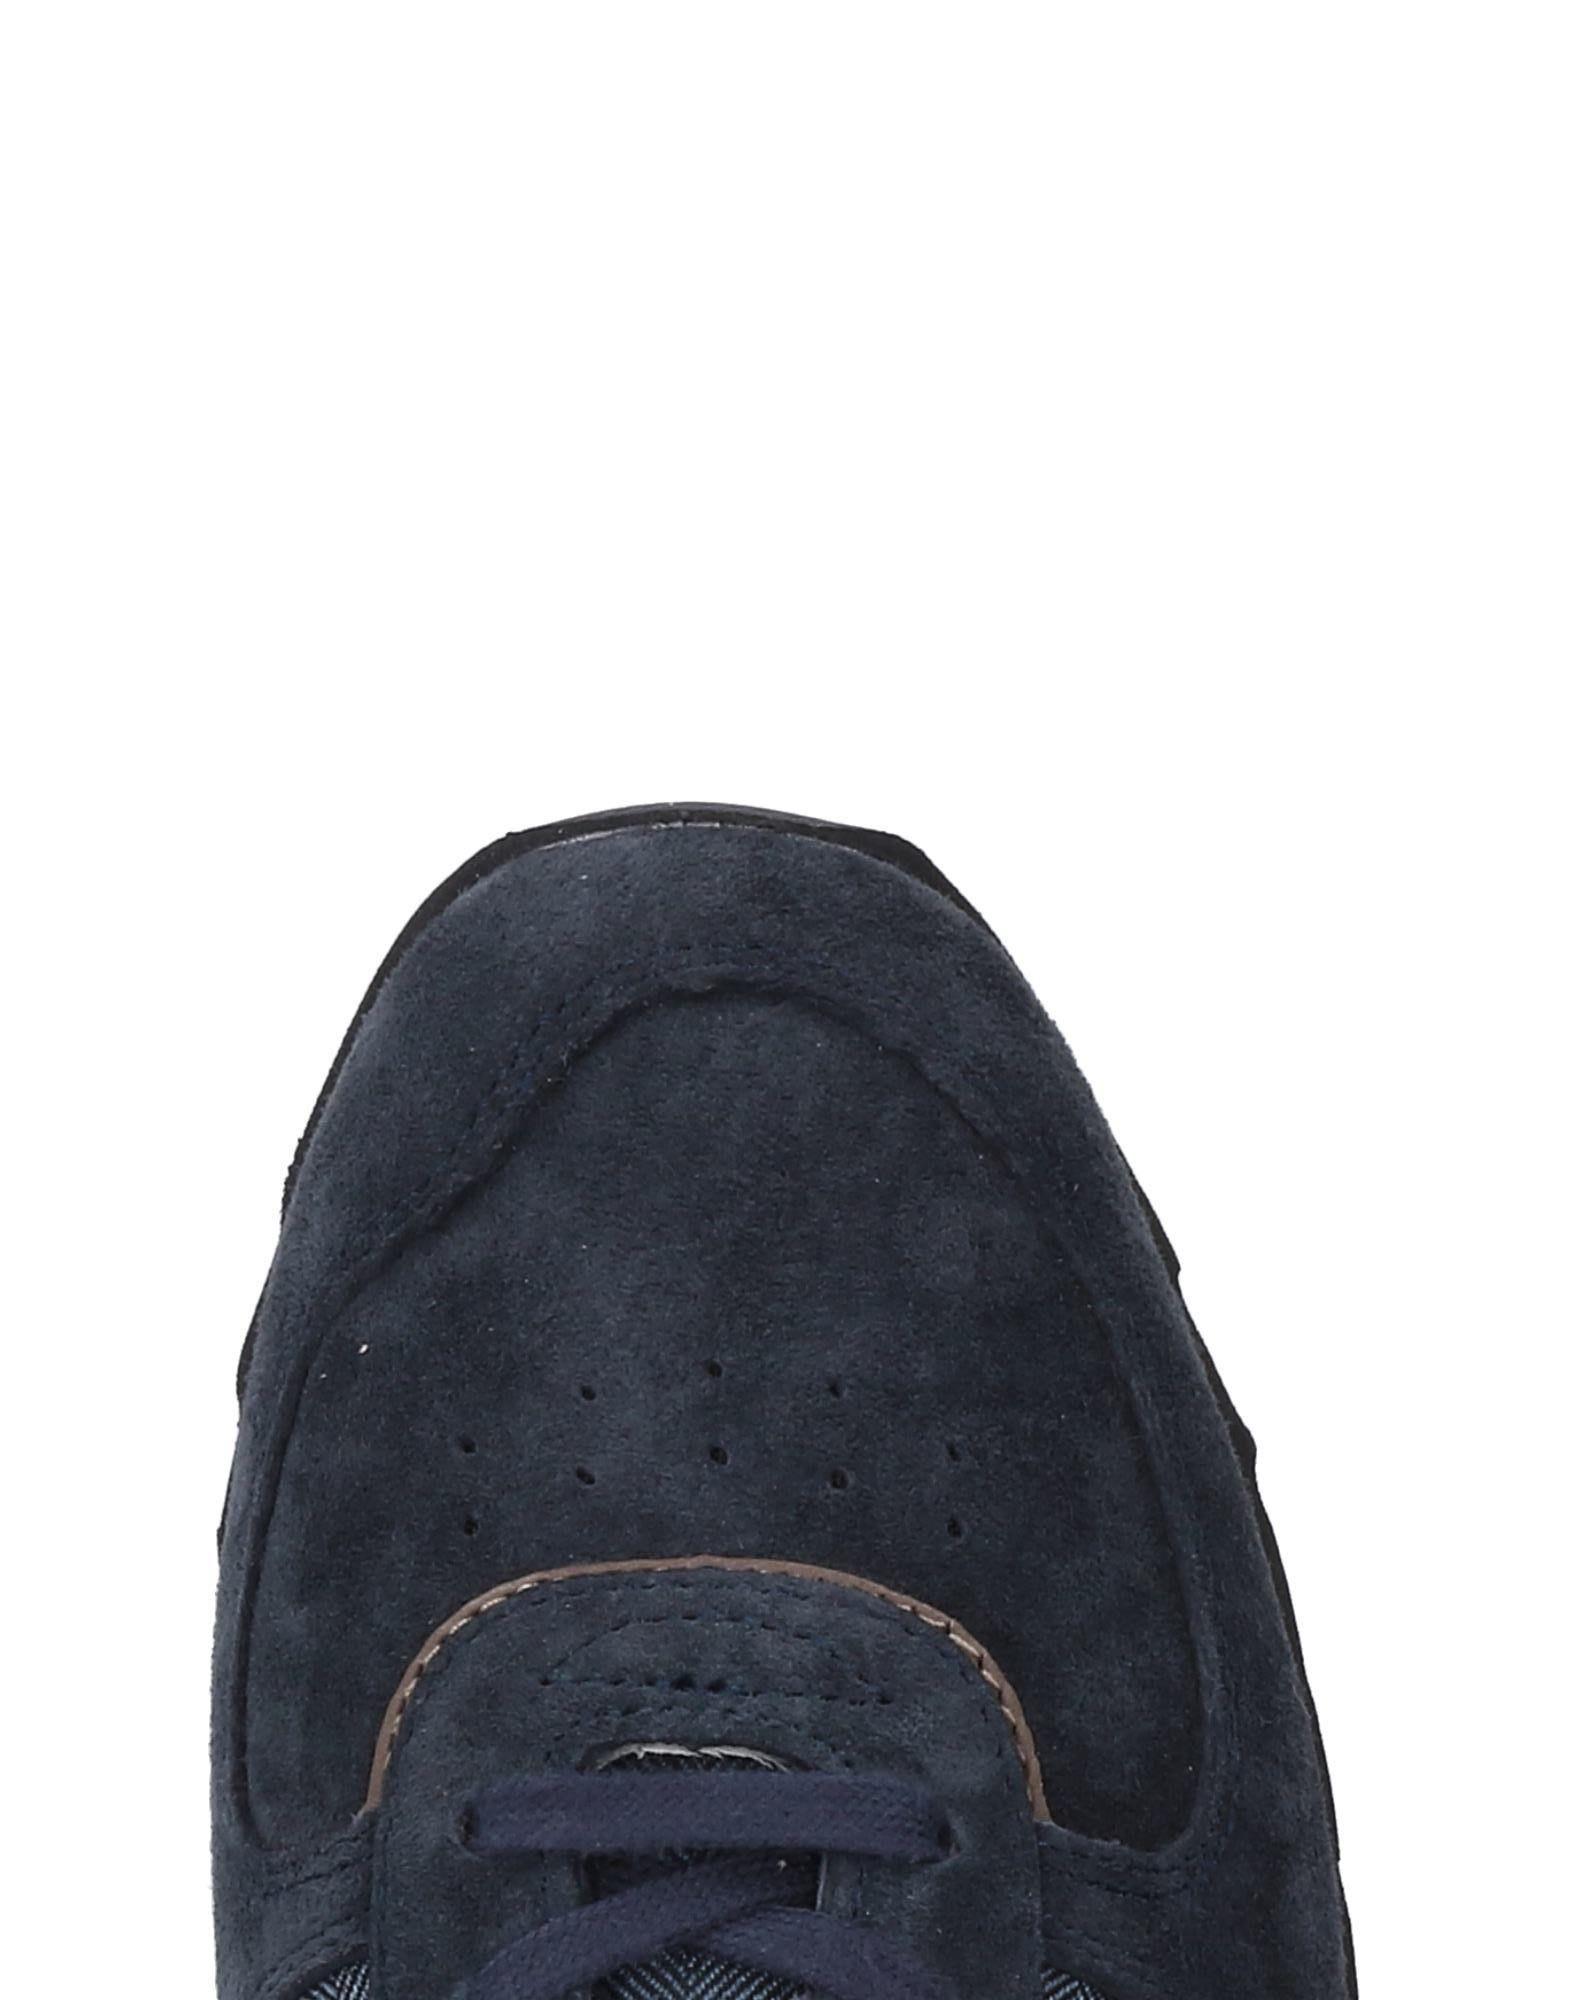 Rabatt echte Schuhe Lotto 11503456VX Leggenda Sneakers Herren  11503456VX Lotto 2262a7